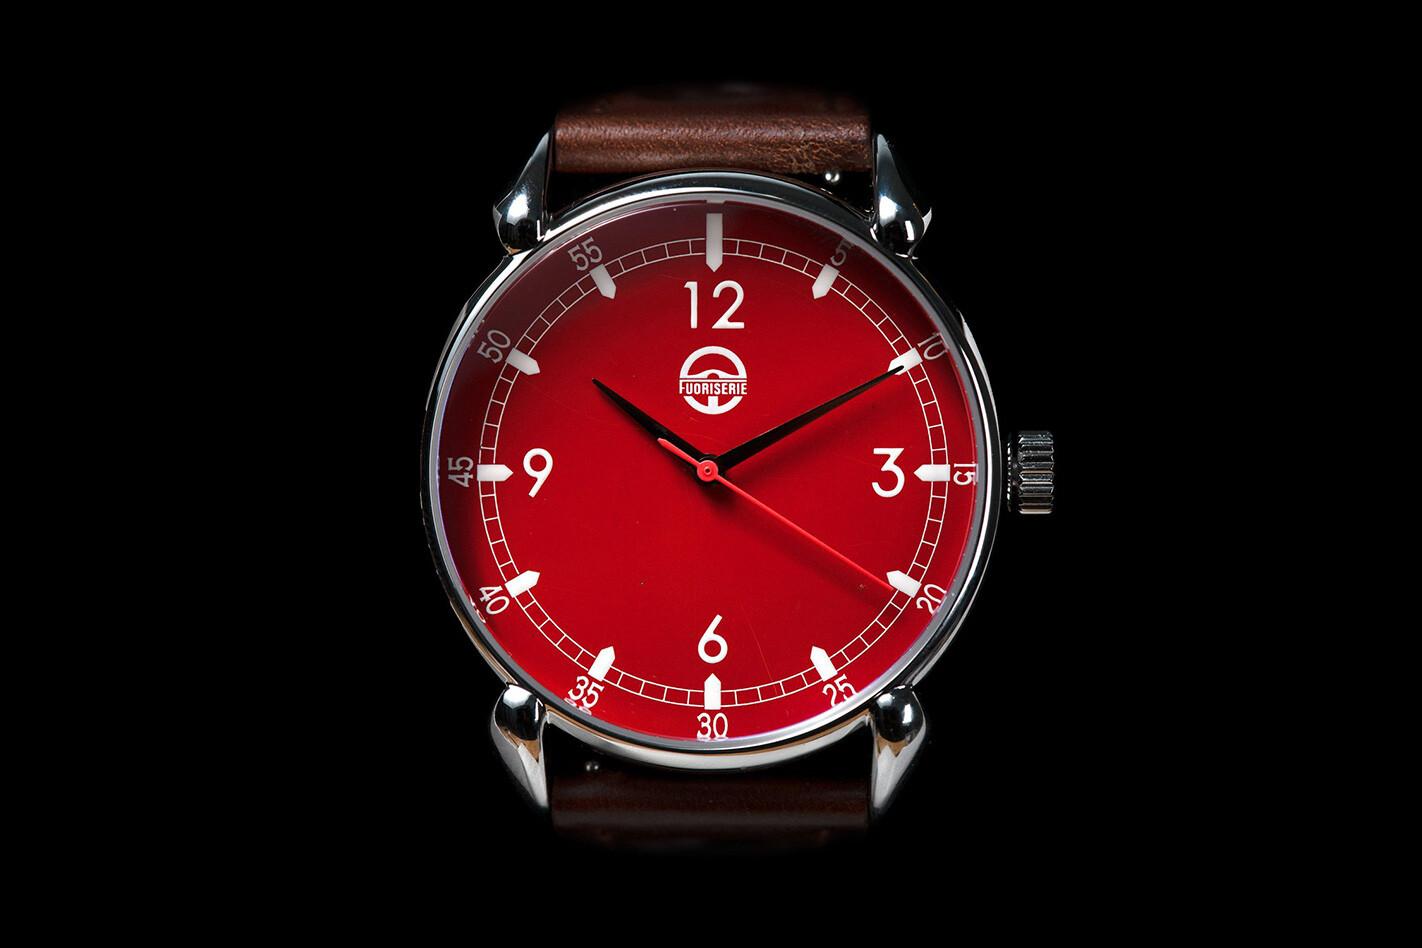 Cool Kit Watch Jpg